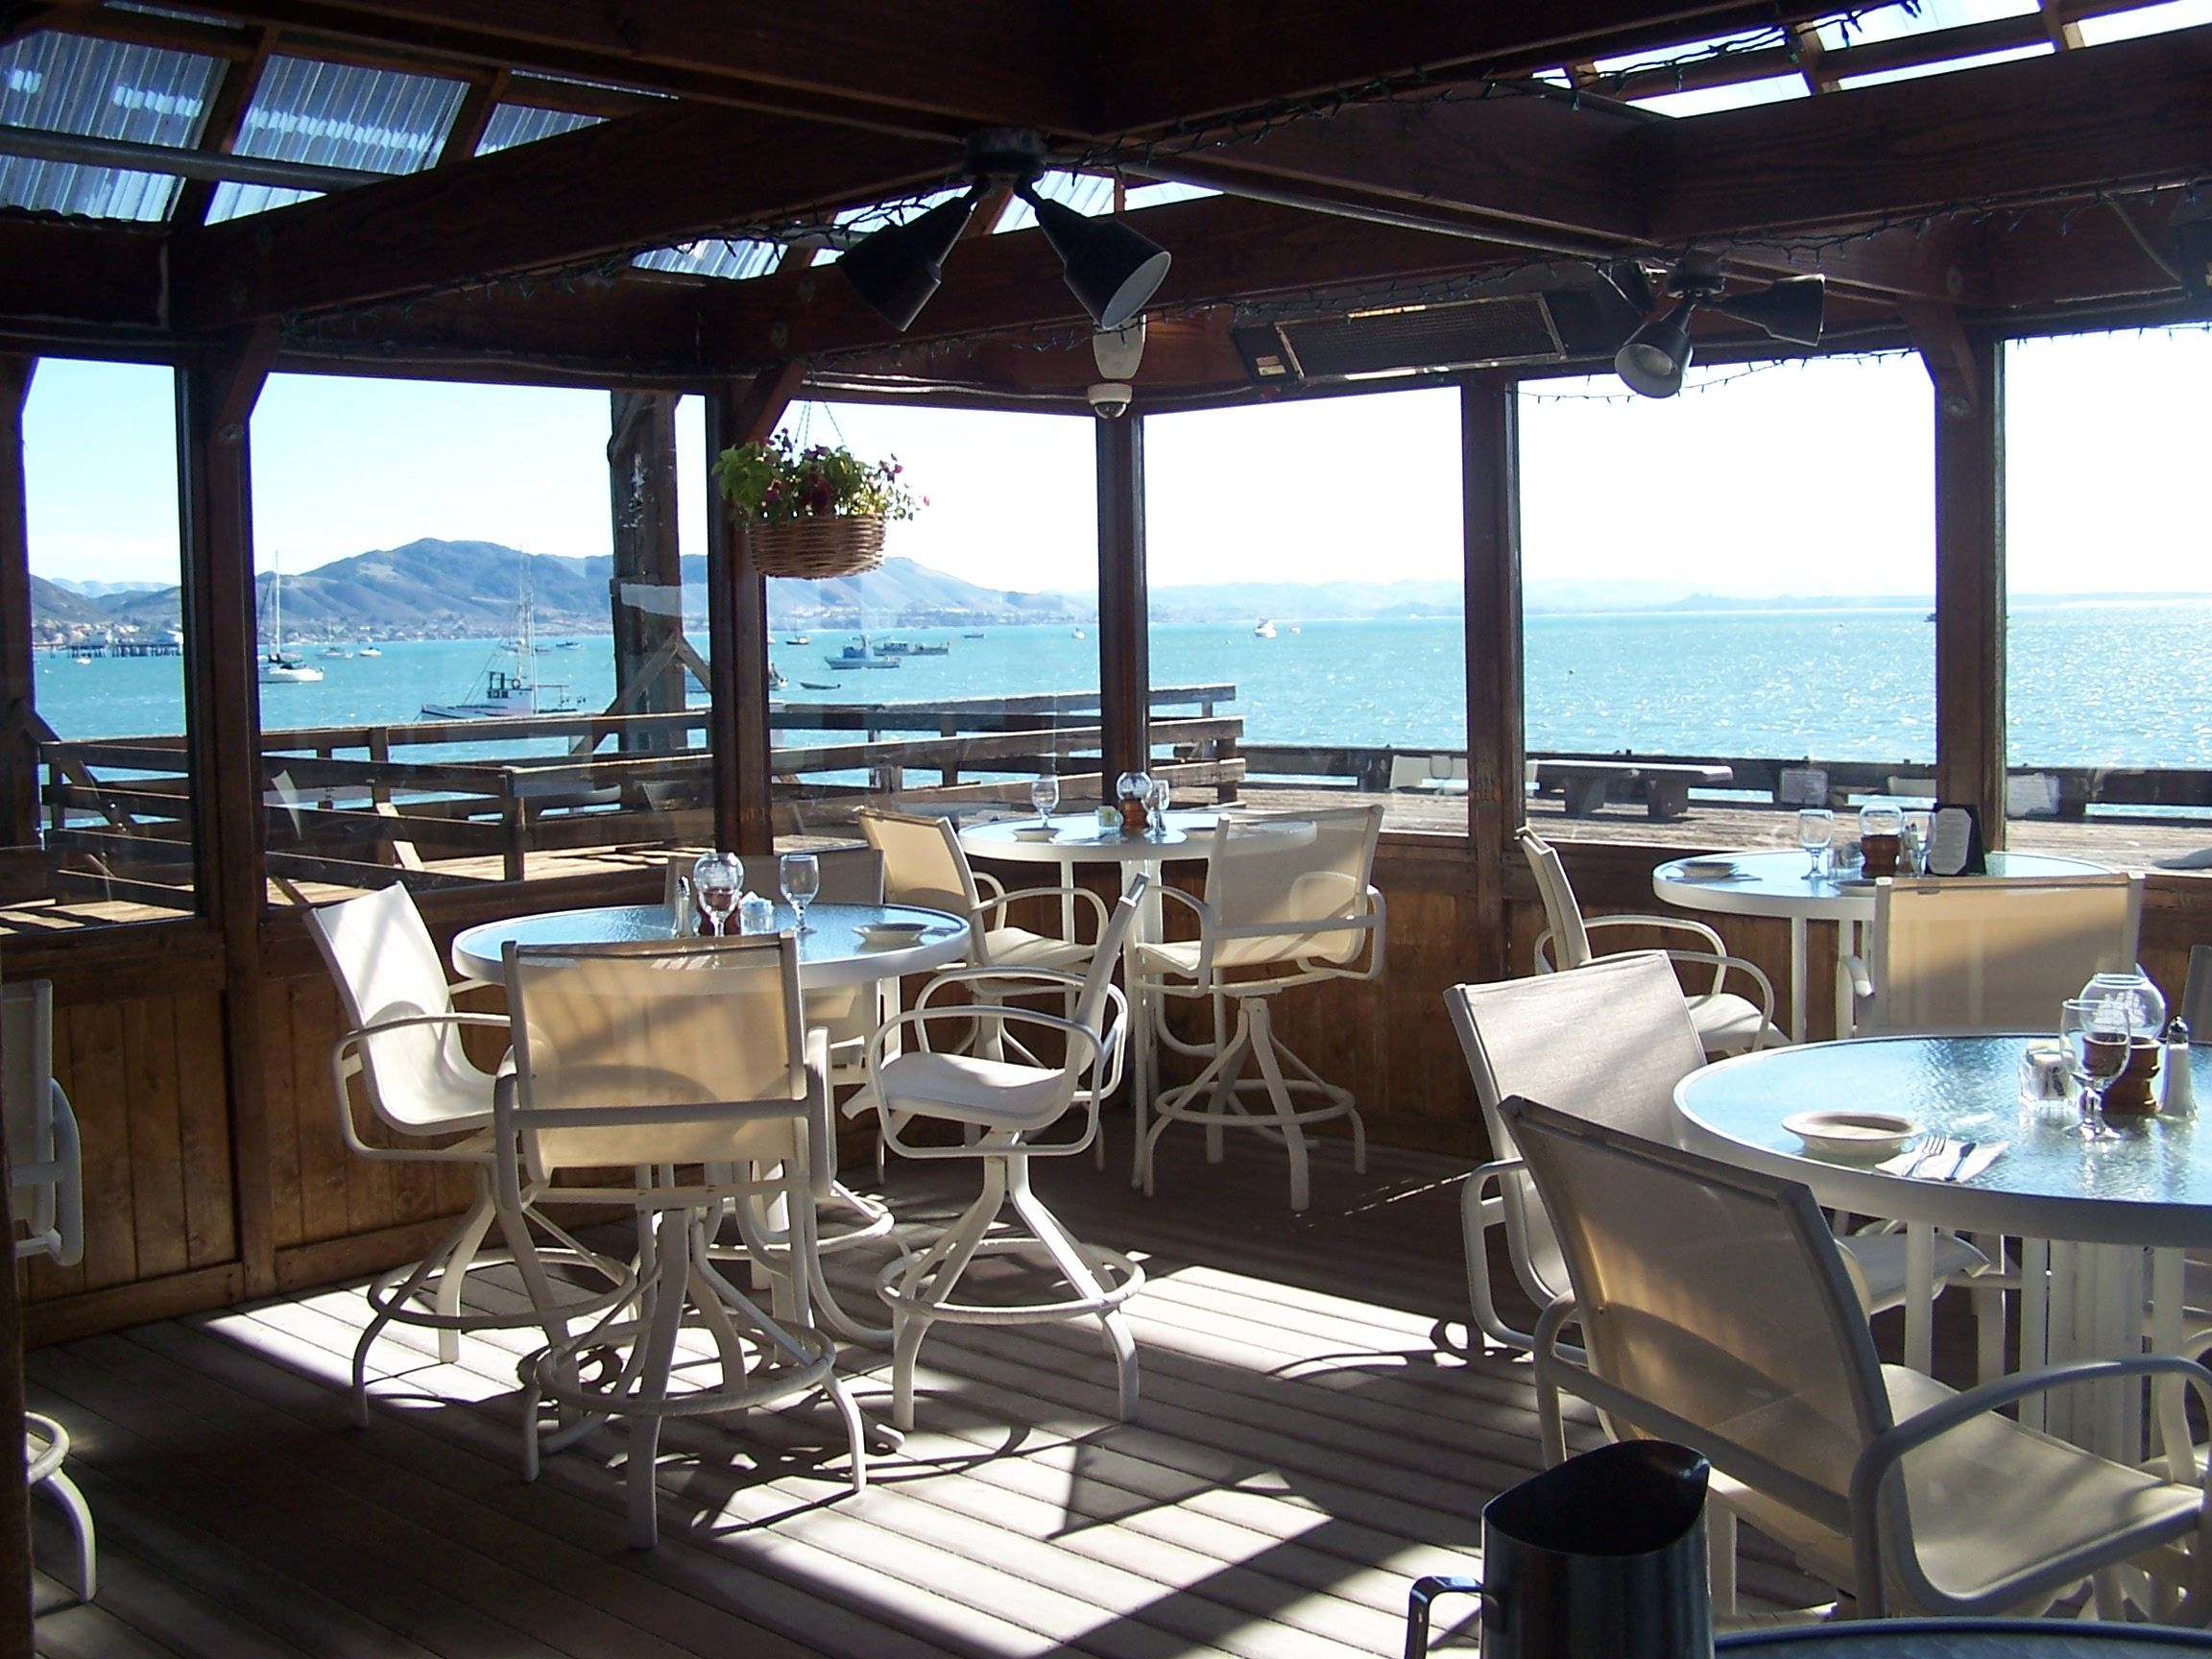 Back Patio On The Harford Pier At The Olde Port Inn Restaurant Pismo Beach Restaurants Dream Weekend Coast Restaurant